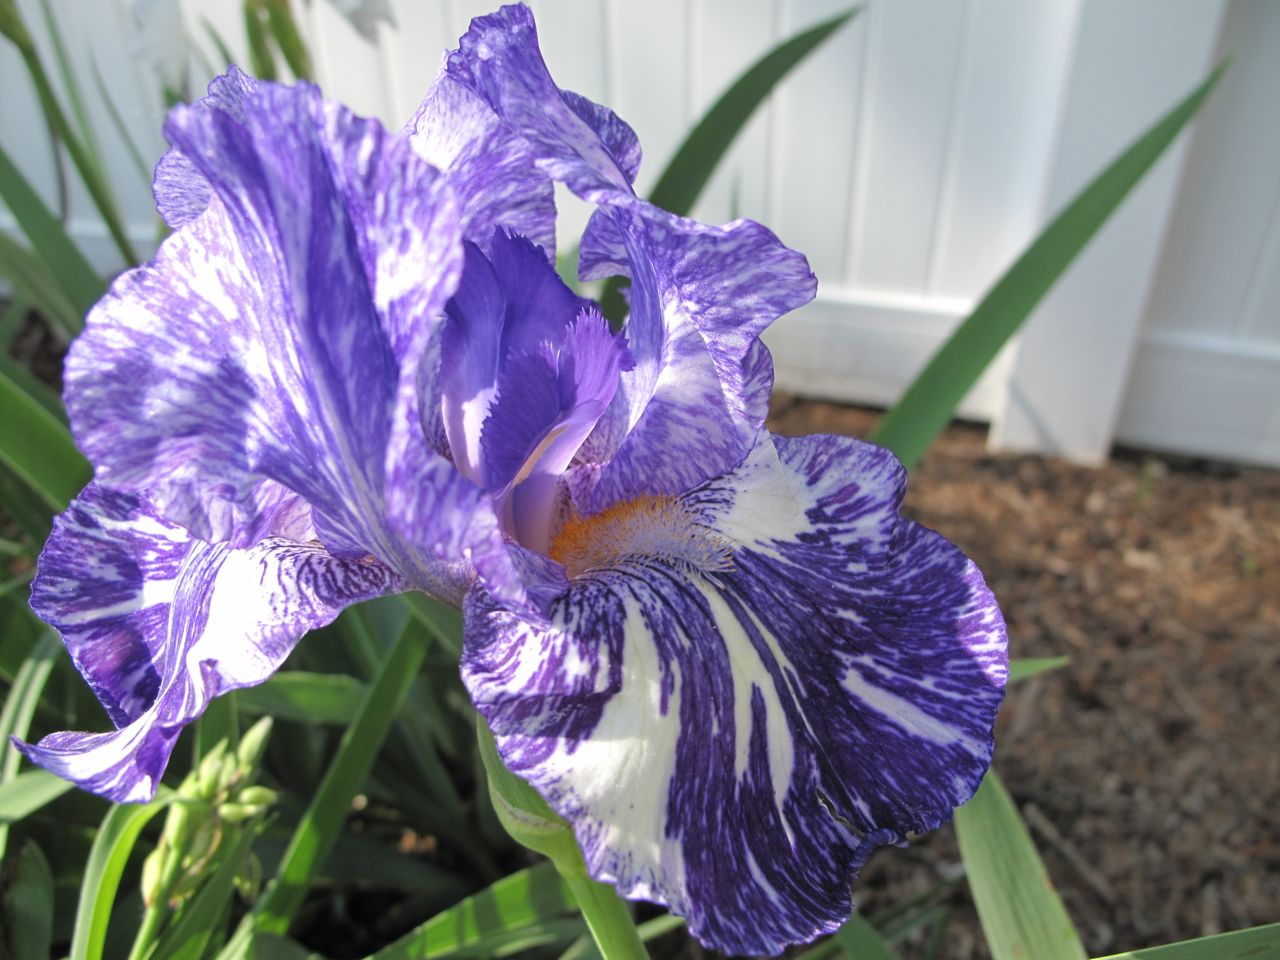 Spring garden pbmgarden - Iris germanica ...